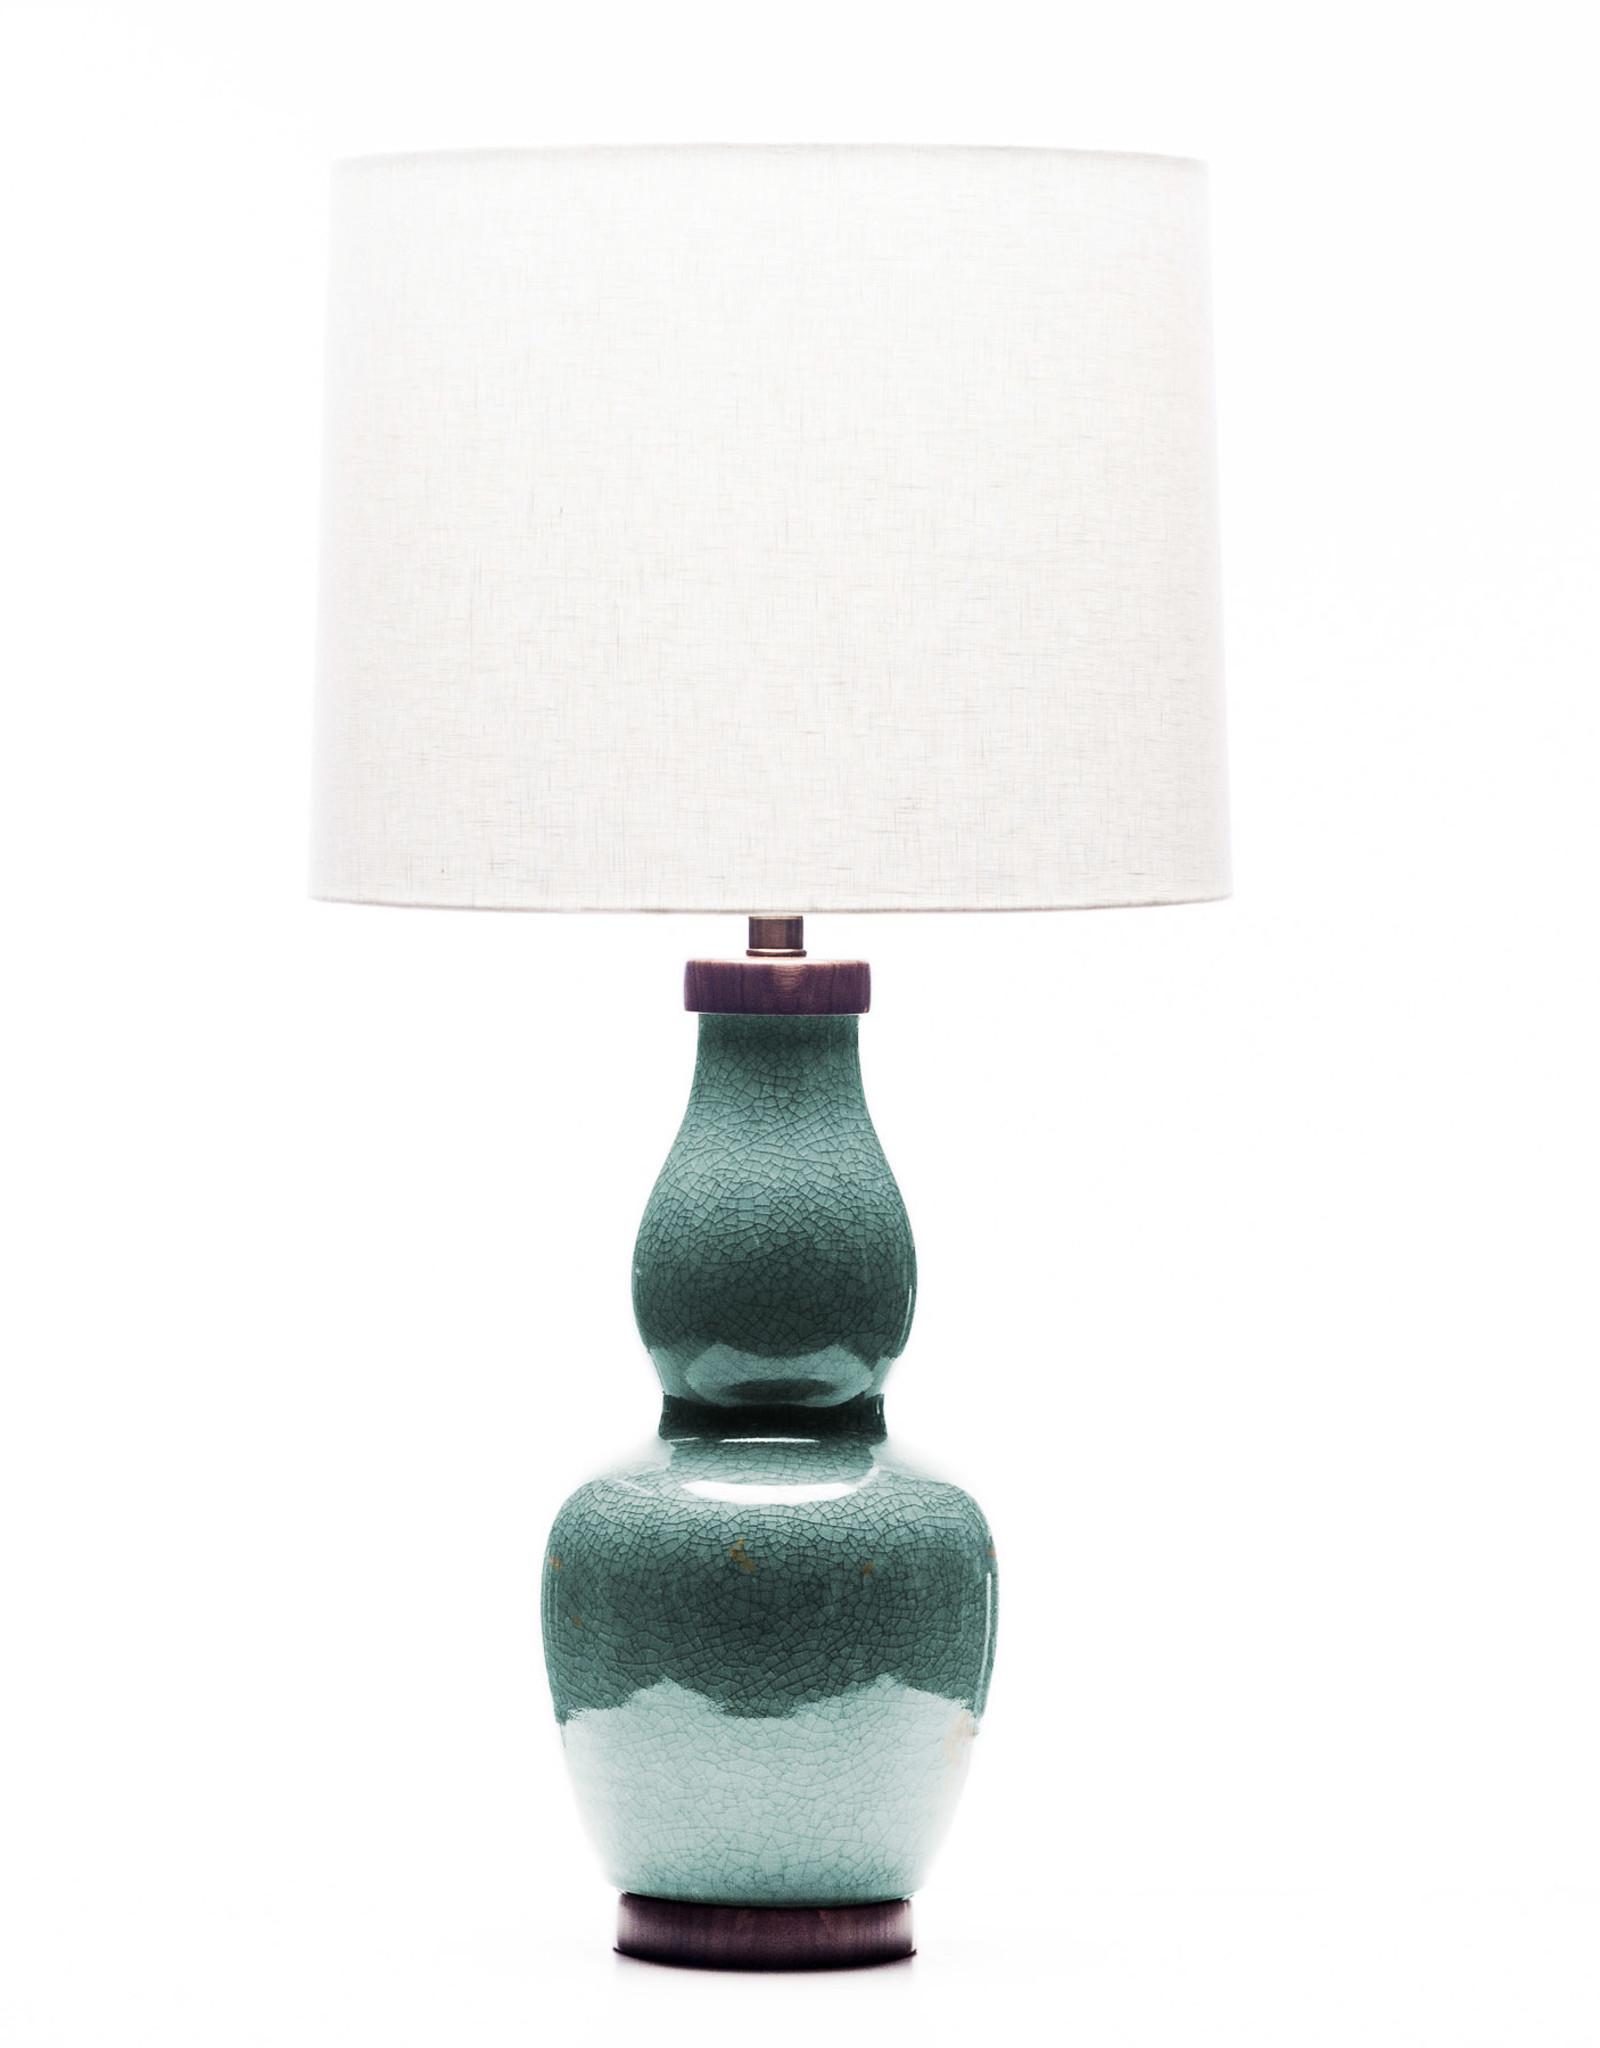 Lawrence & Scott Scarlett Porcelain Table Lamp in Aquamarine Crackle with Walnut Base